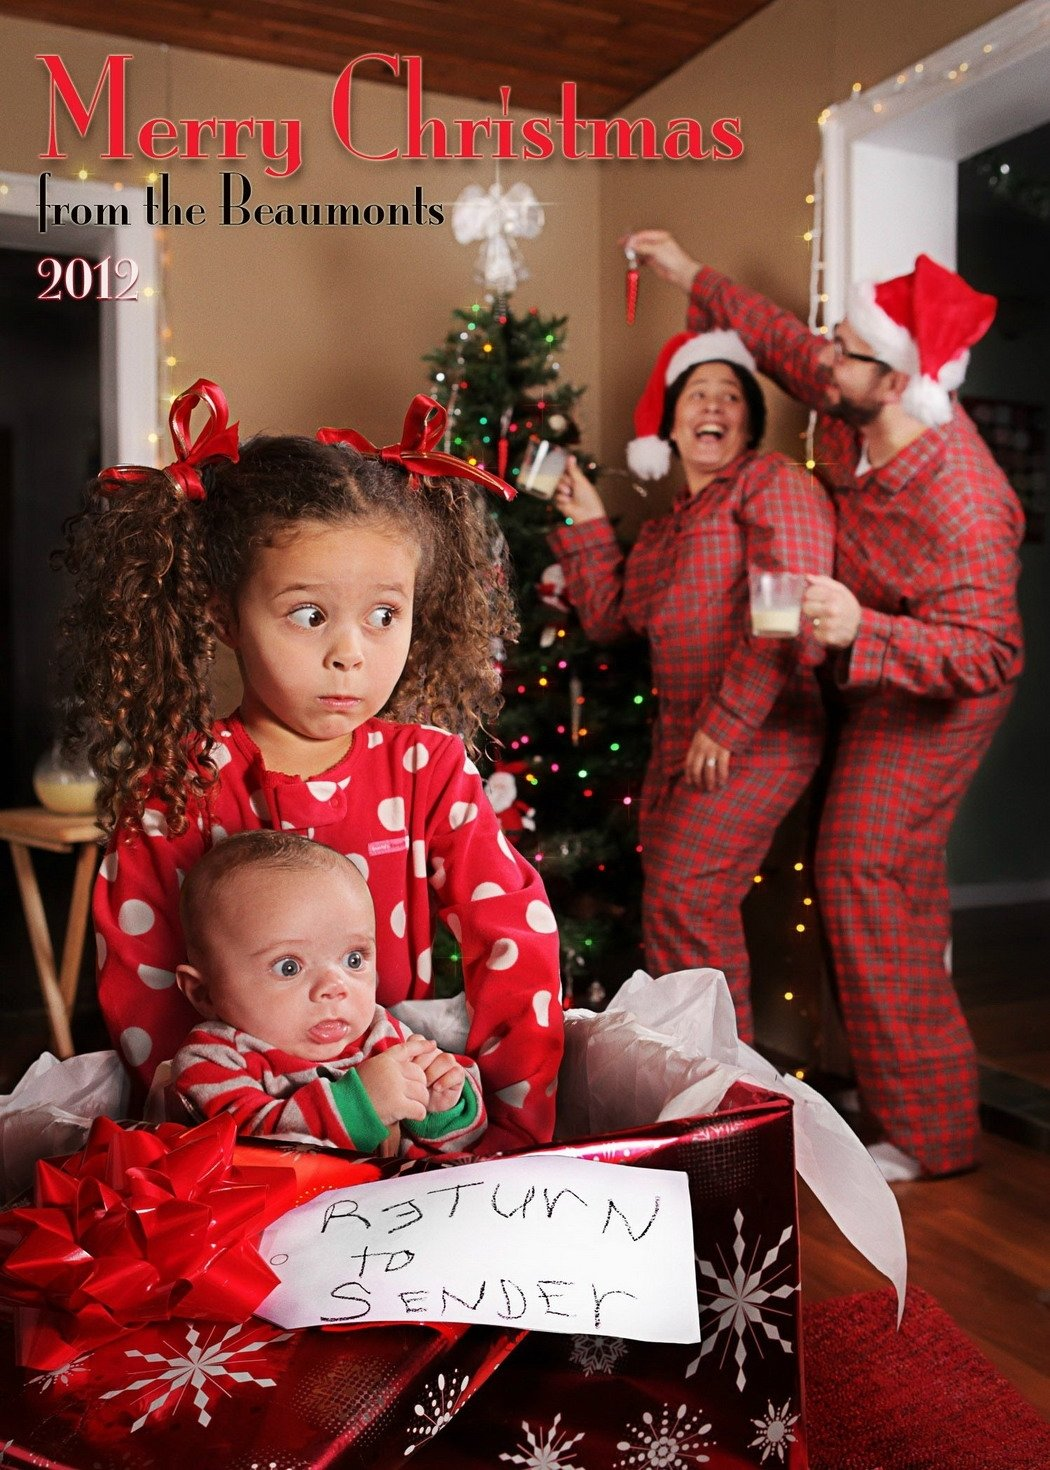 10 Fabulous Unique Family Christmas Photo Ideas